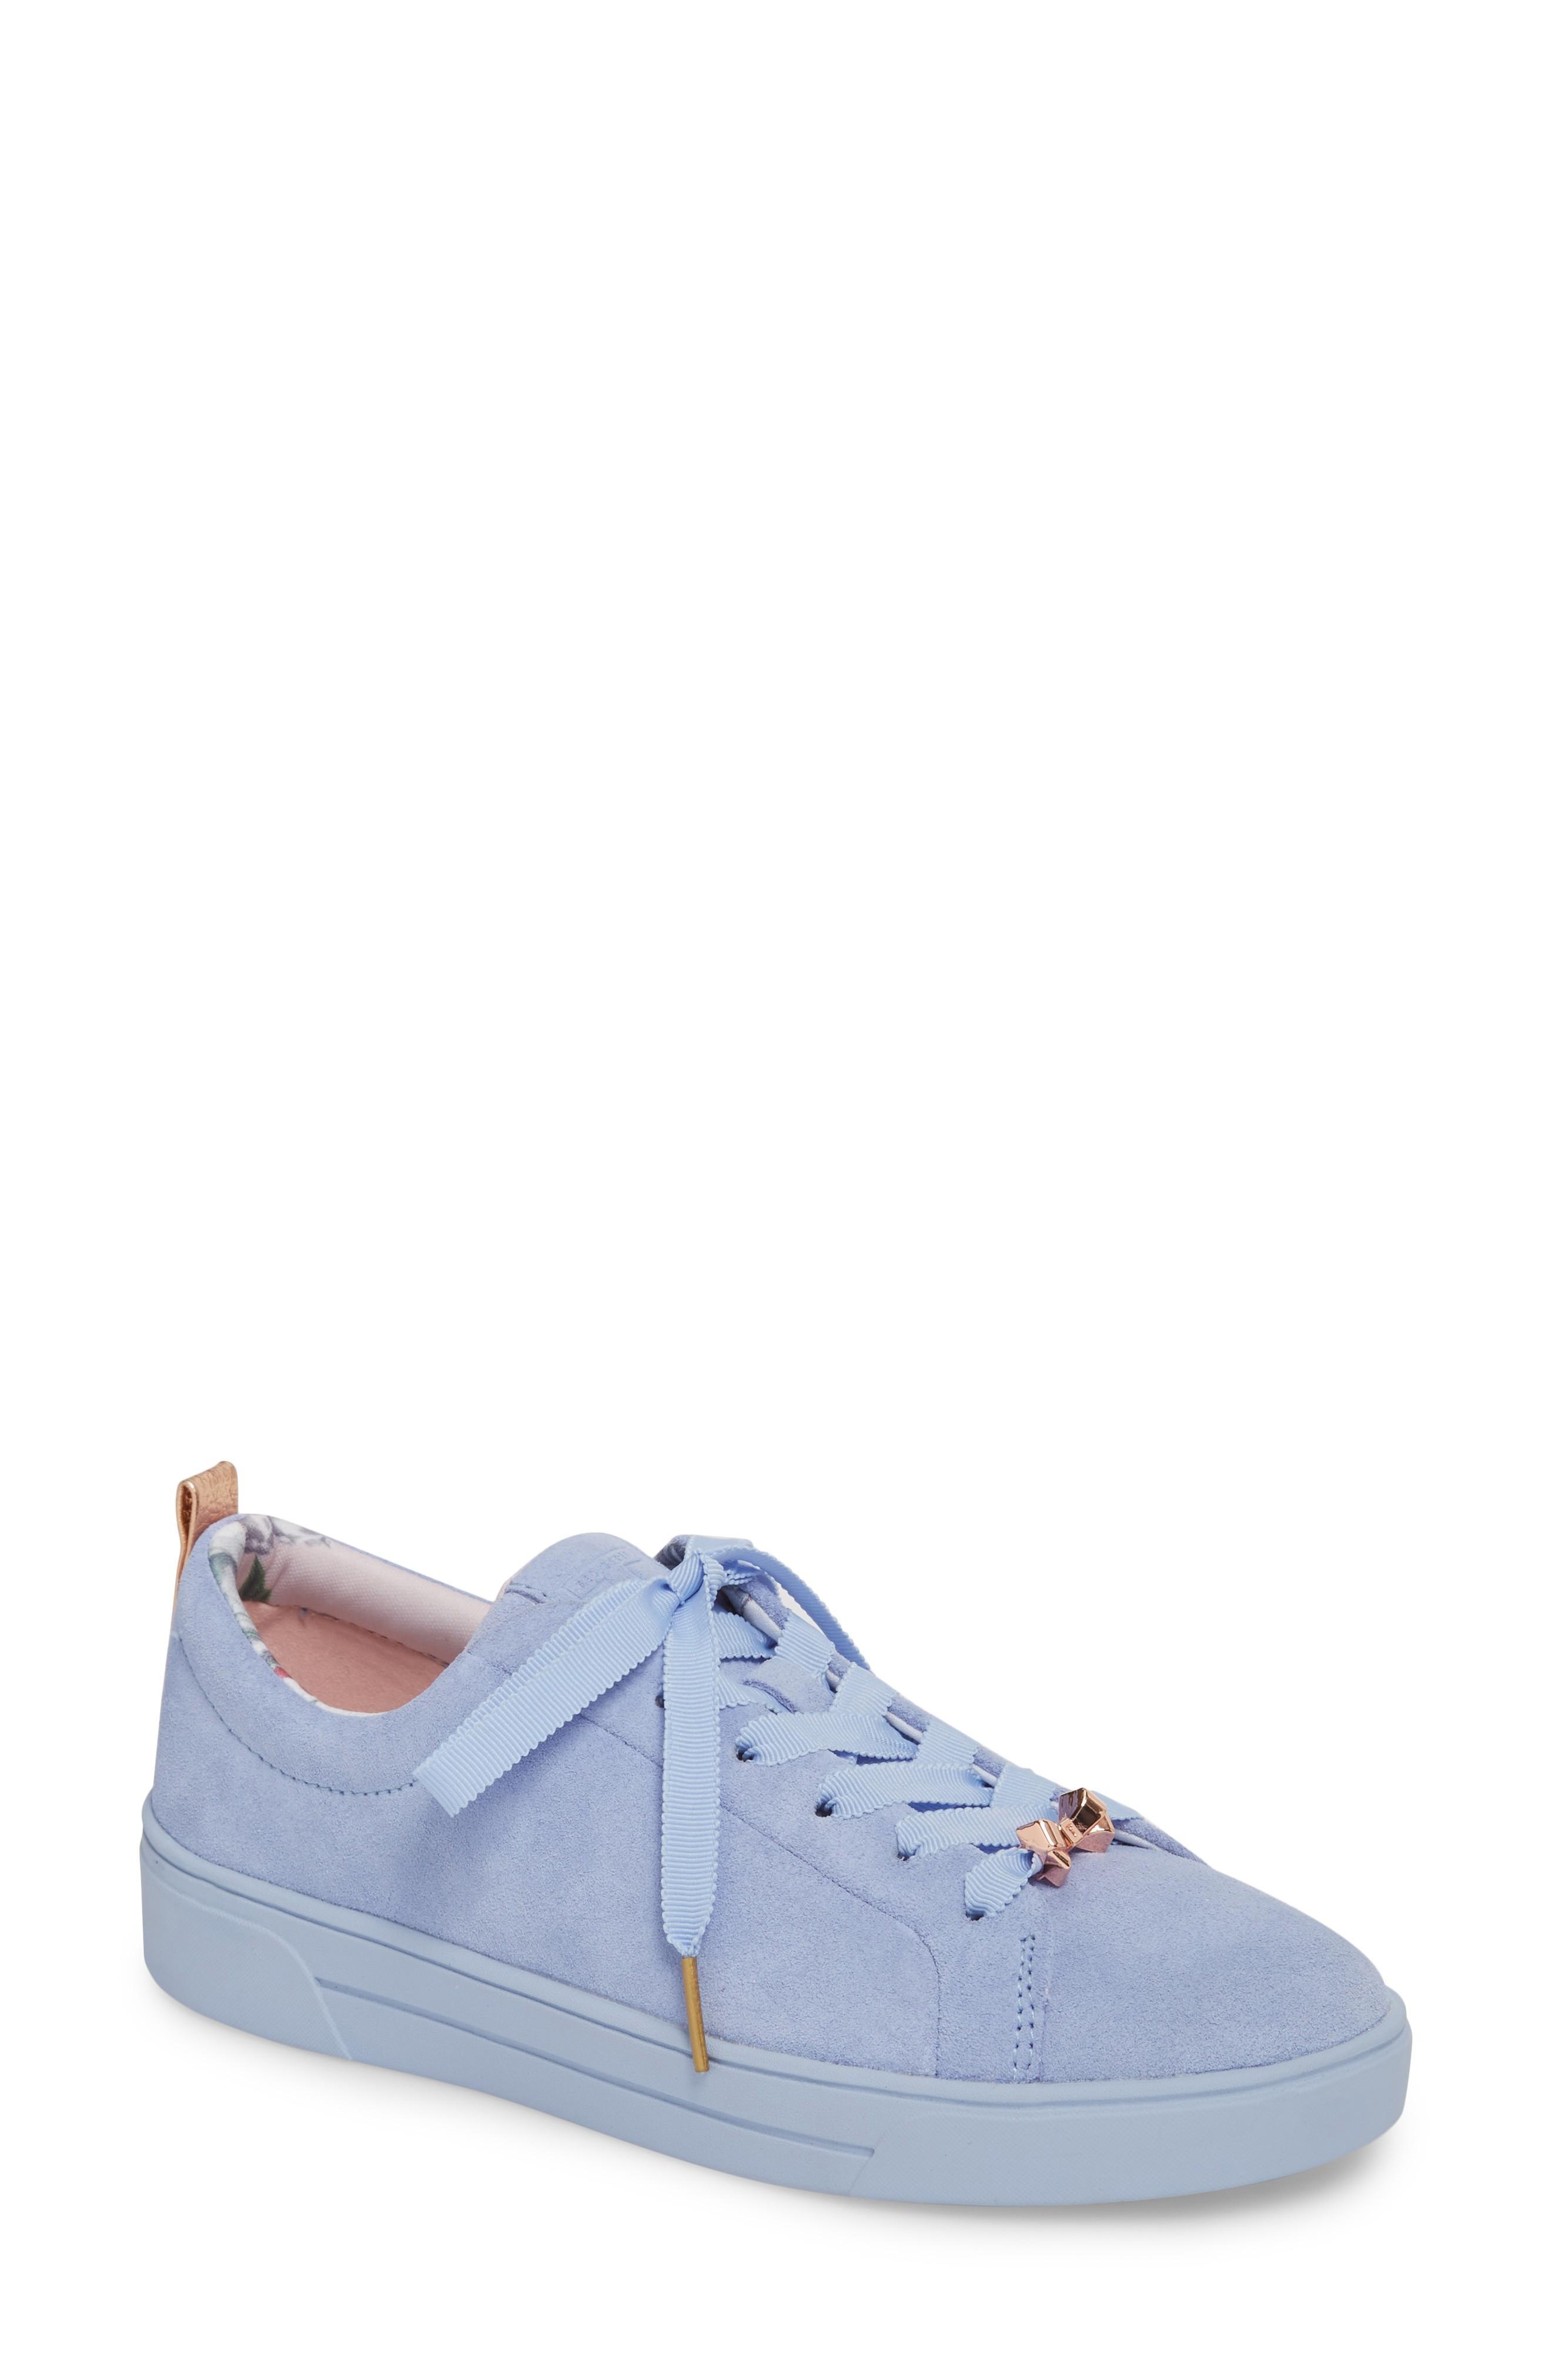 3a1d7c6bbd1161 Ted Baker Kelleis Sneaker In Light Blue Suede